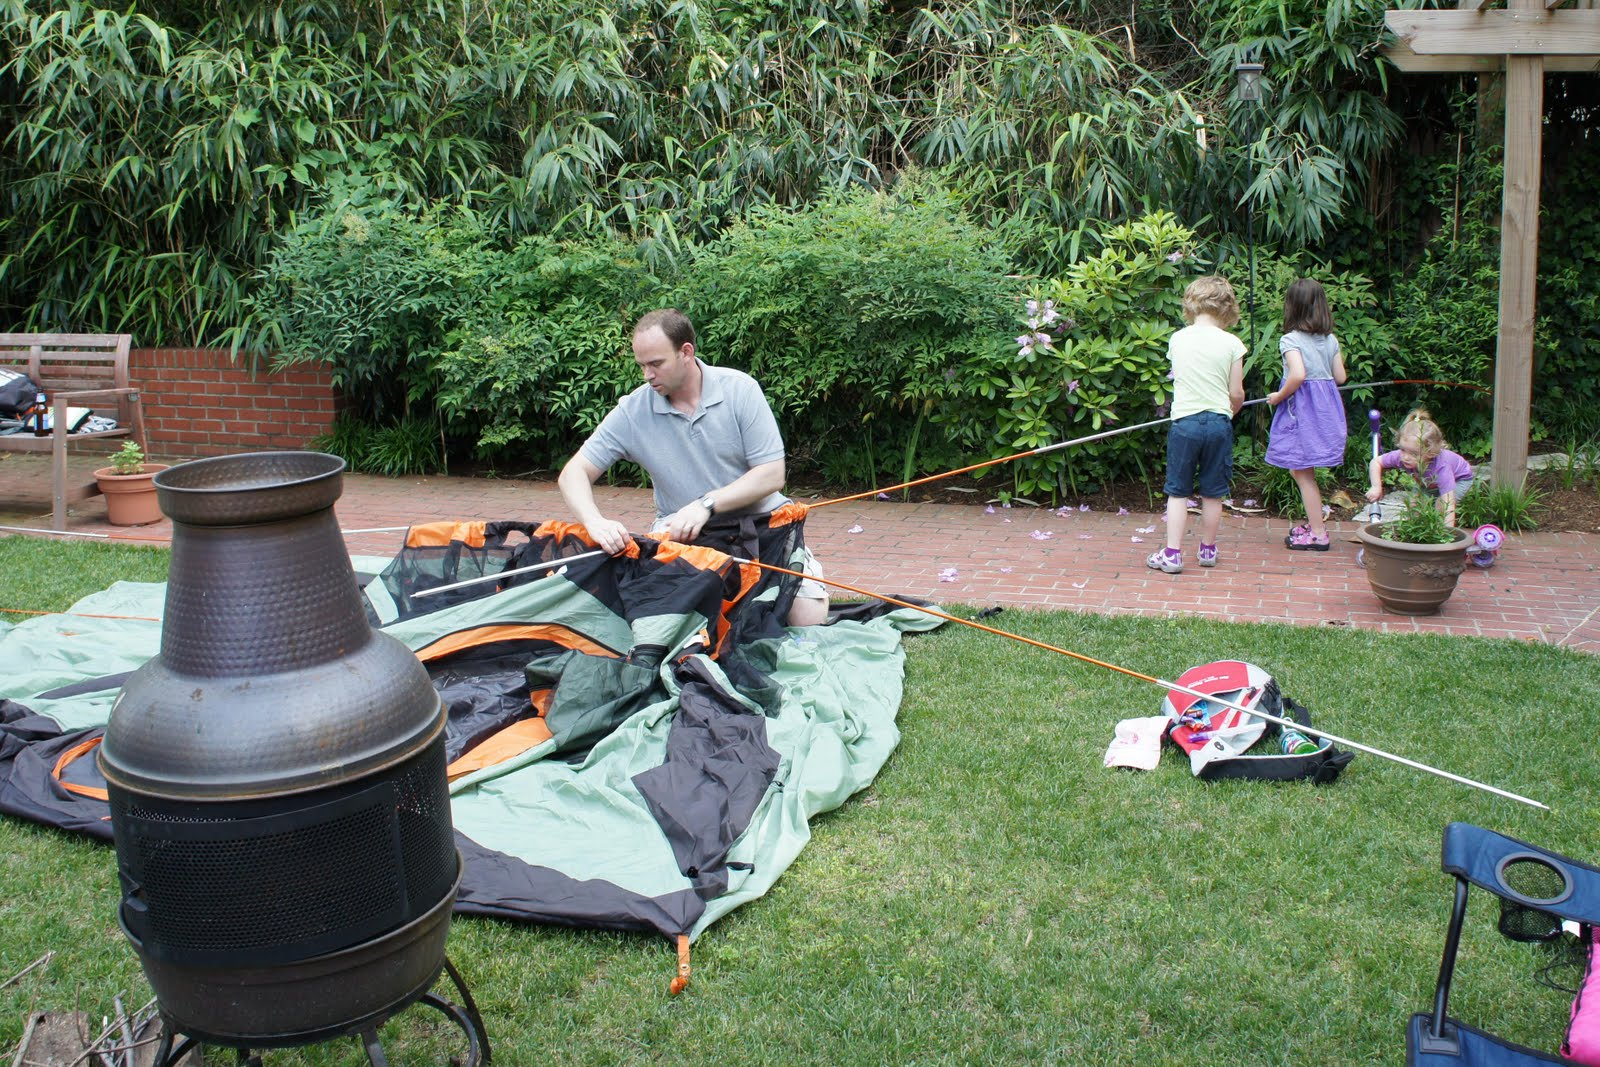 The OHara Family Backyard Camping